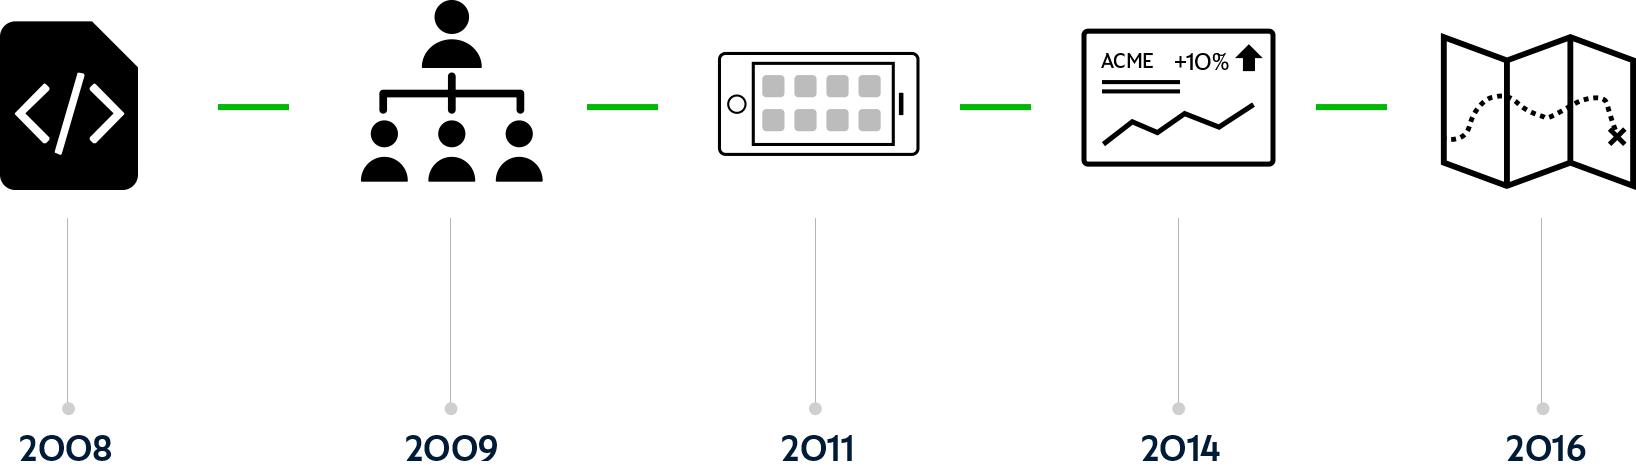 MojoTech Timeline